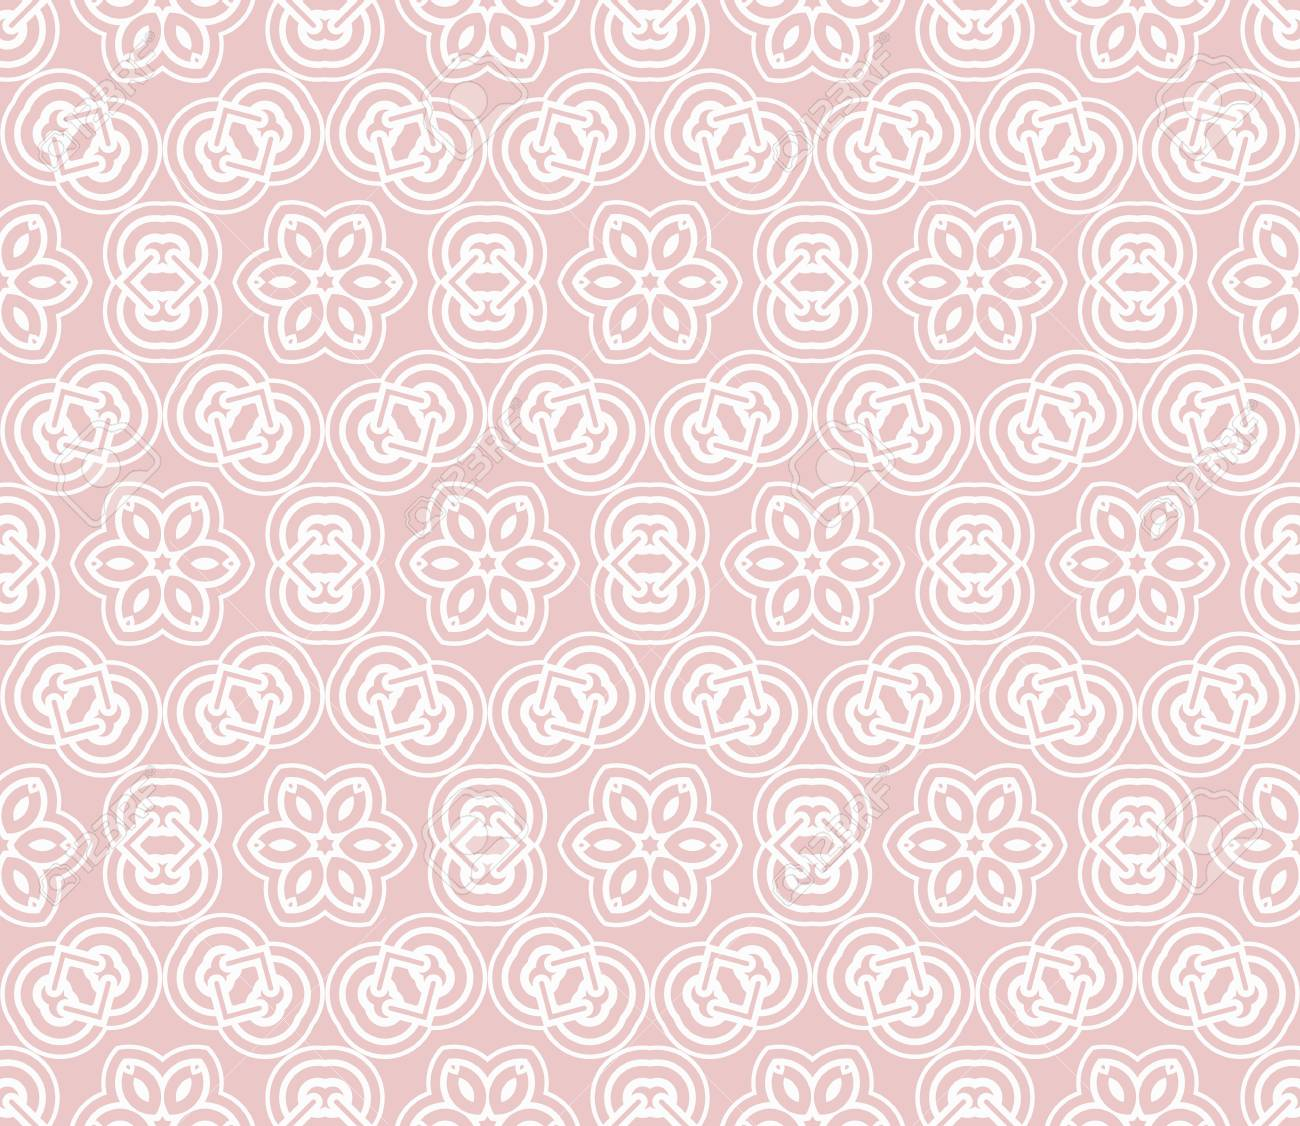 vector illustration. new modern geometric pattern. seamless design for scrapbooking, background, interior - 101701095